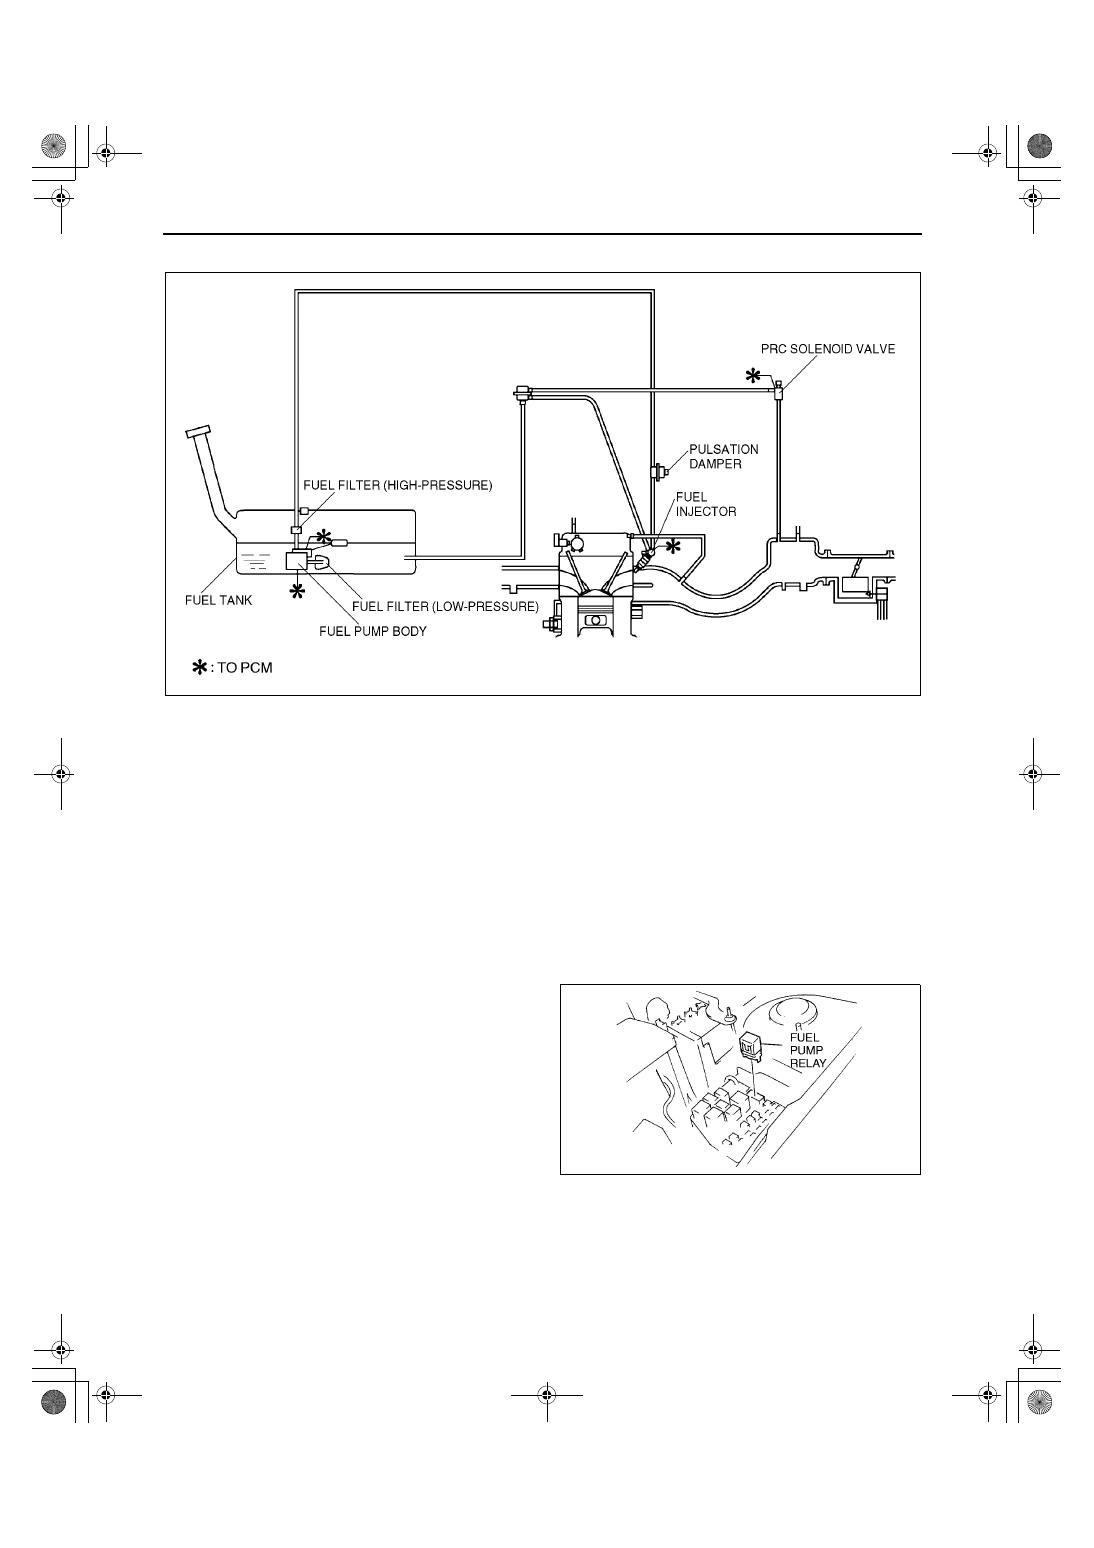 Mazda Protege 5 Manual Part 144 Fuel Filter Location System